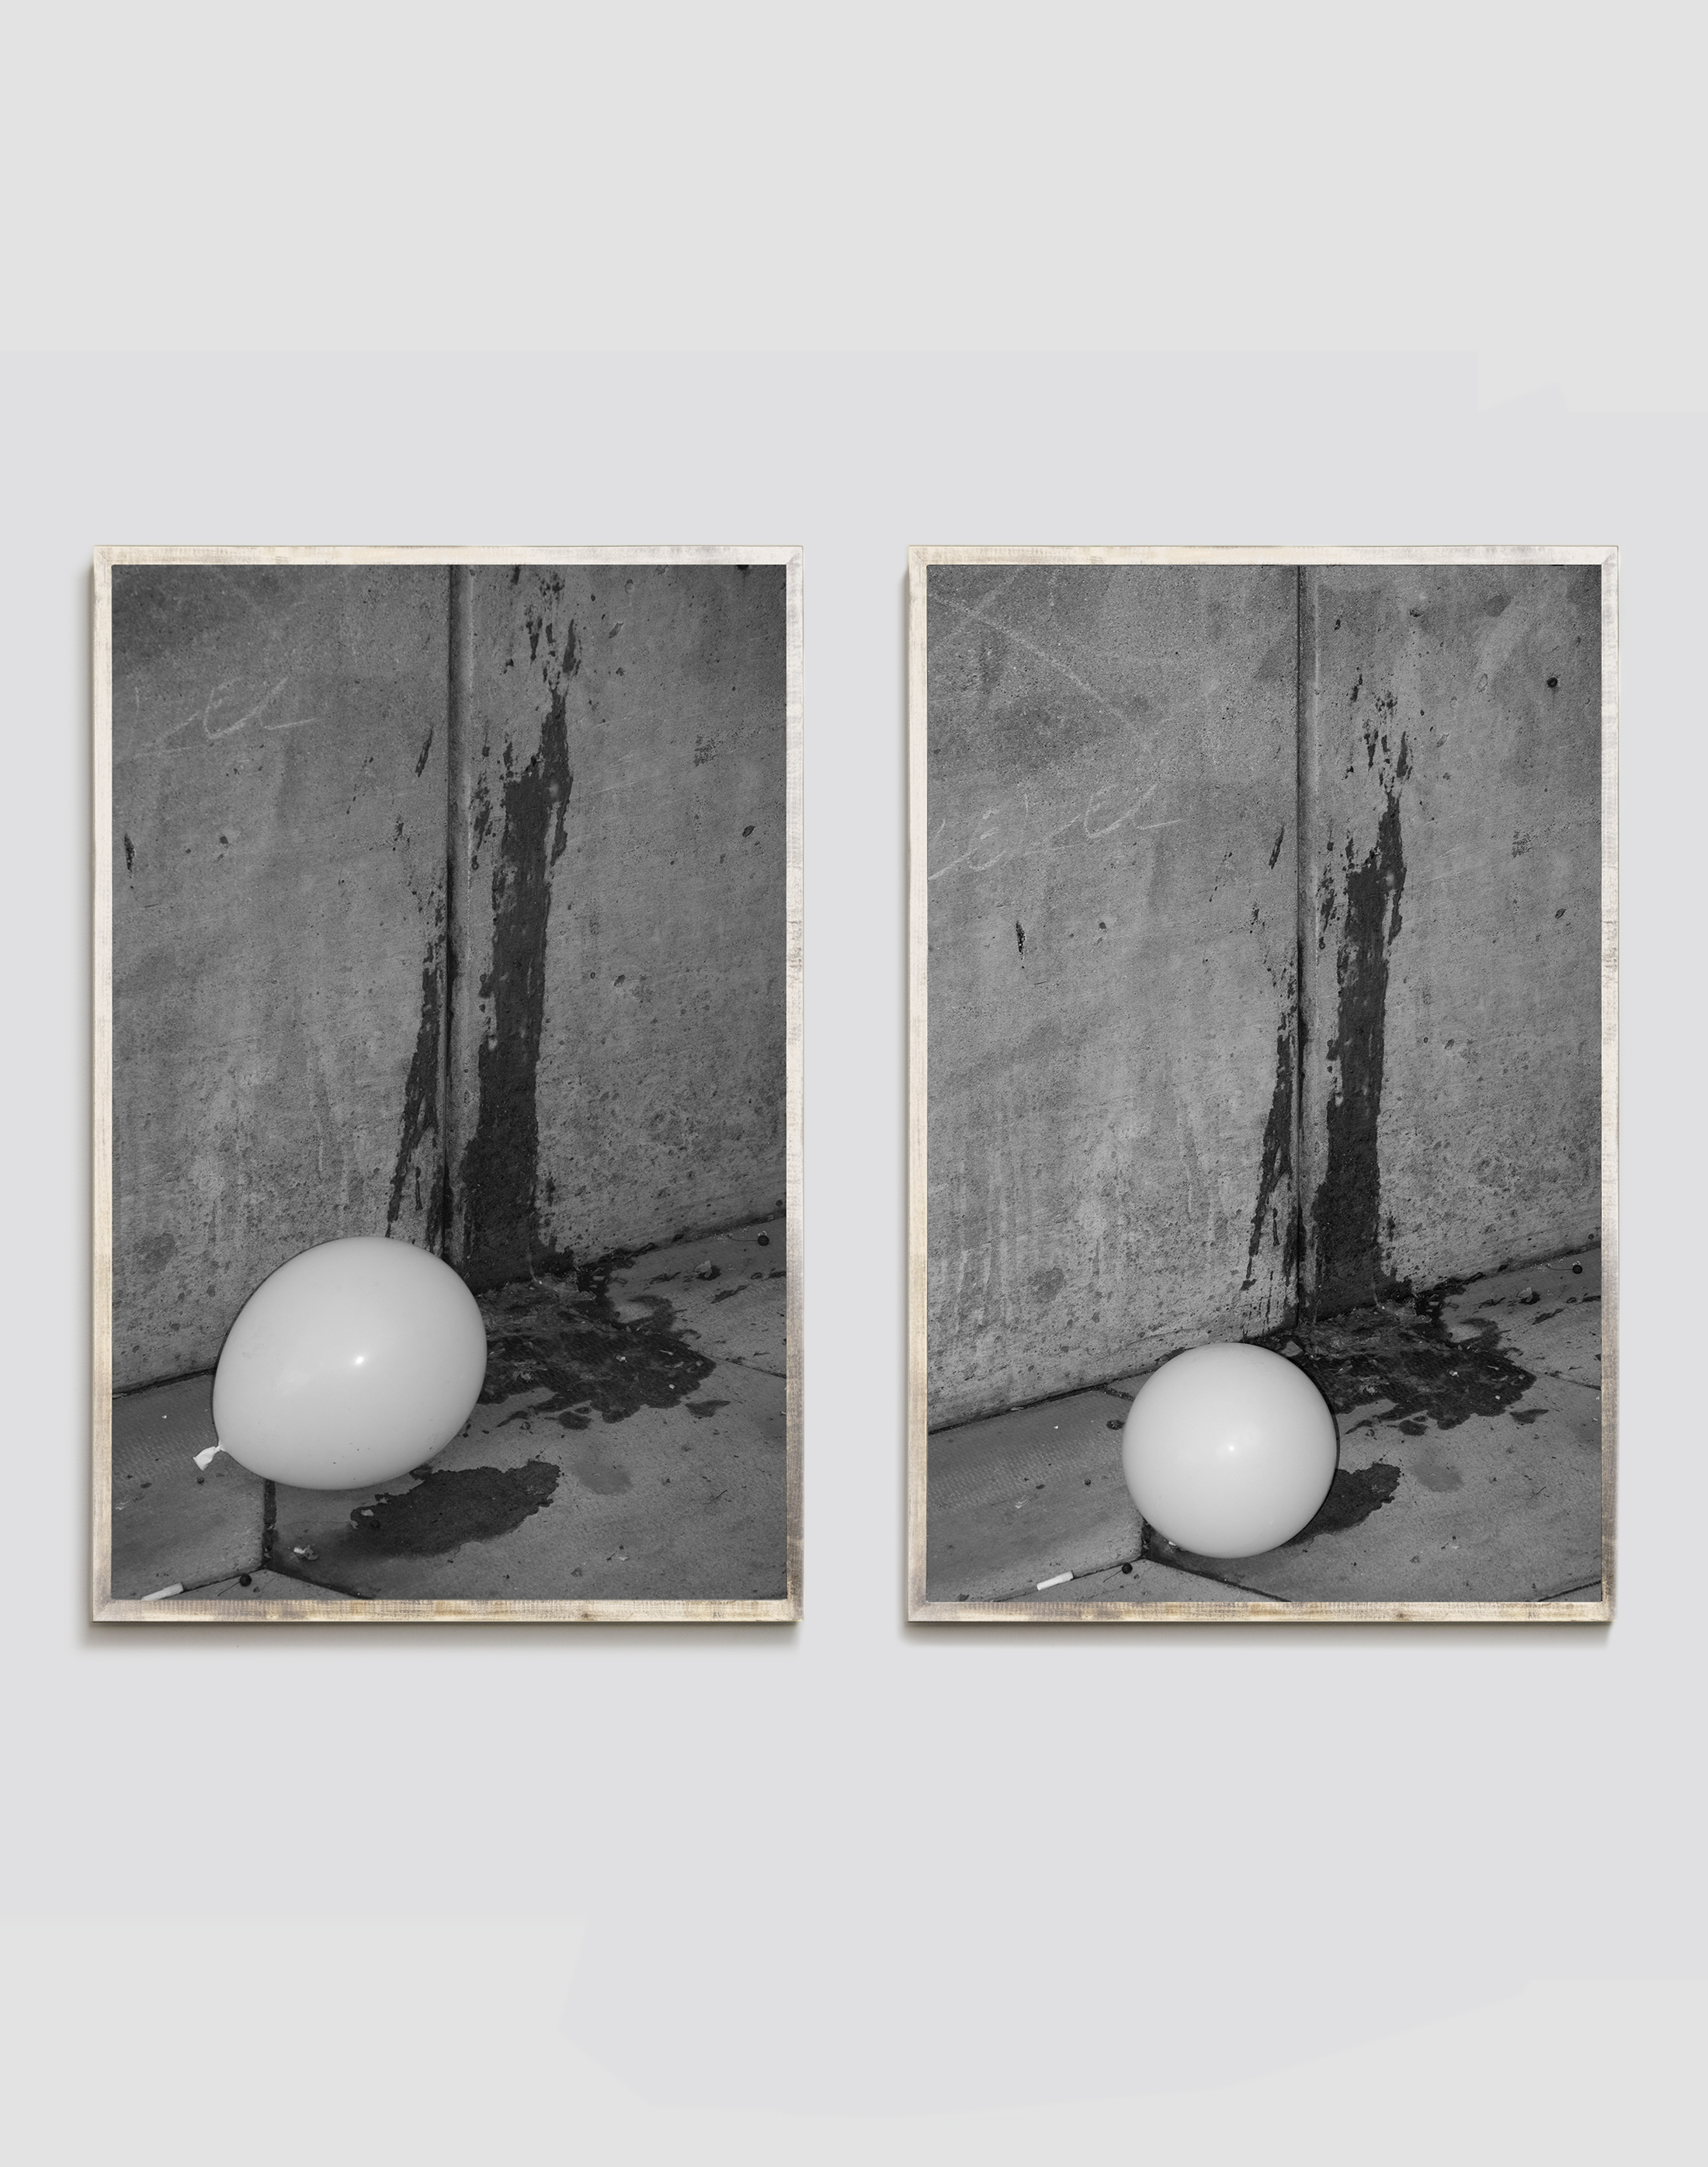 Untitled ( Ballon, Puke) Digital Pigment Print 20x30 inches x2